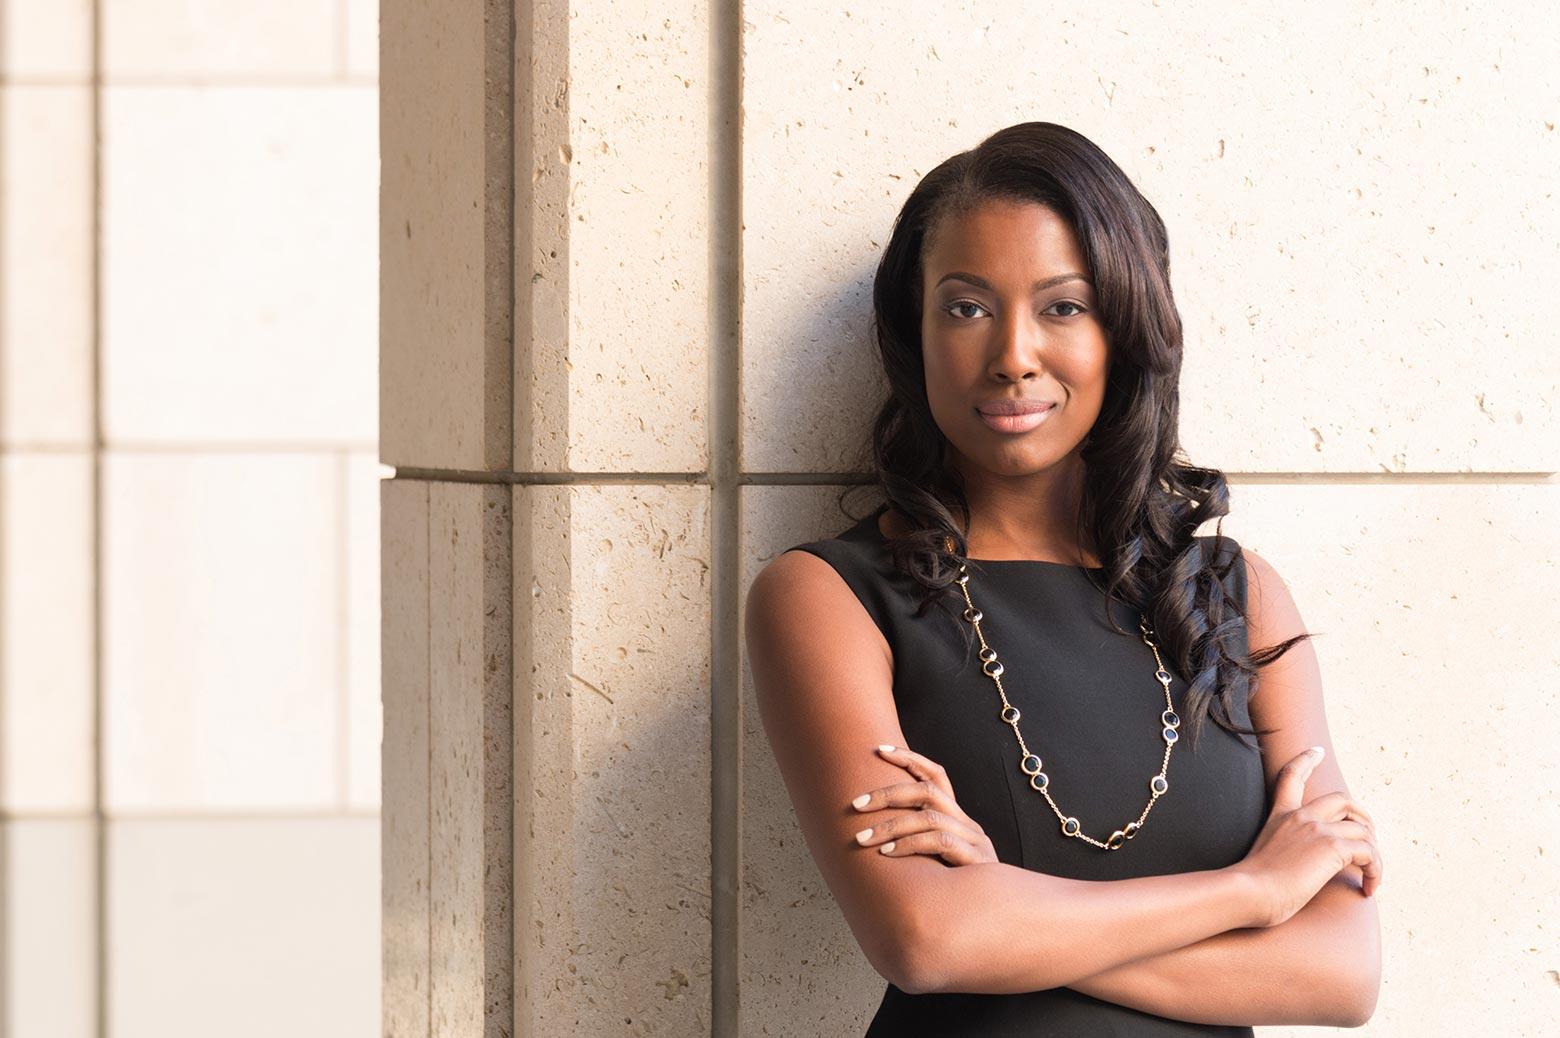 Portrait of Aisha Bowe